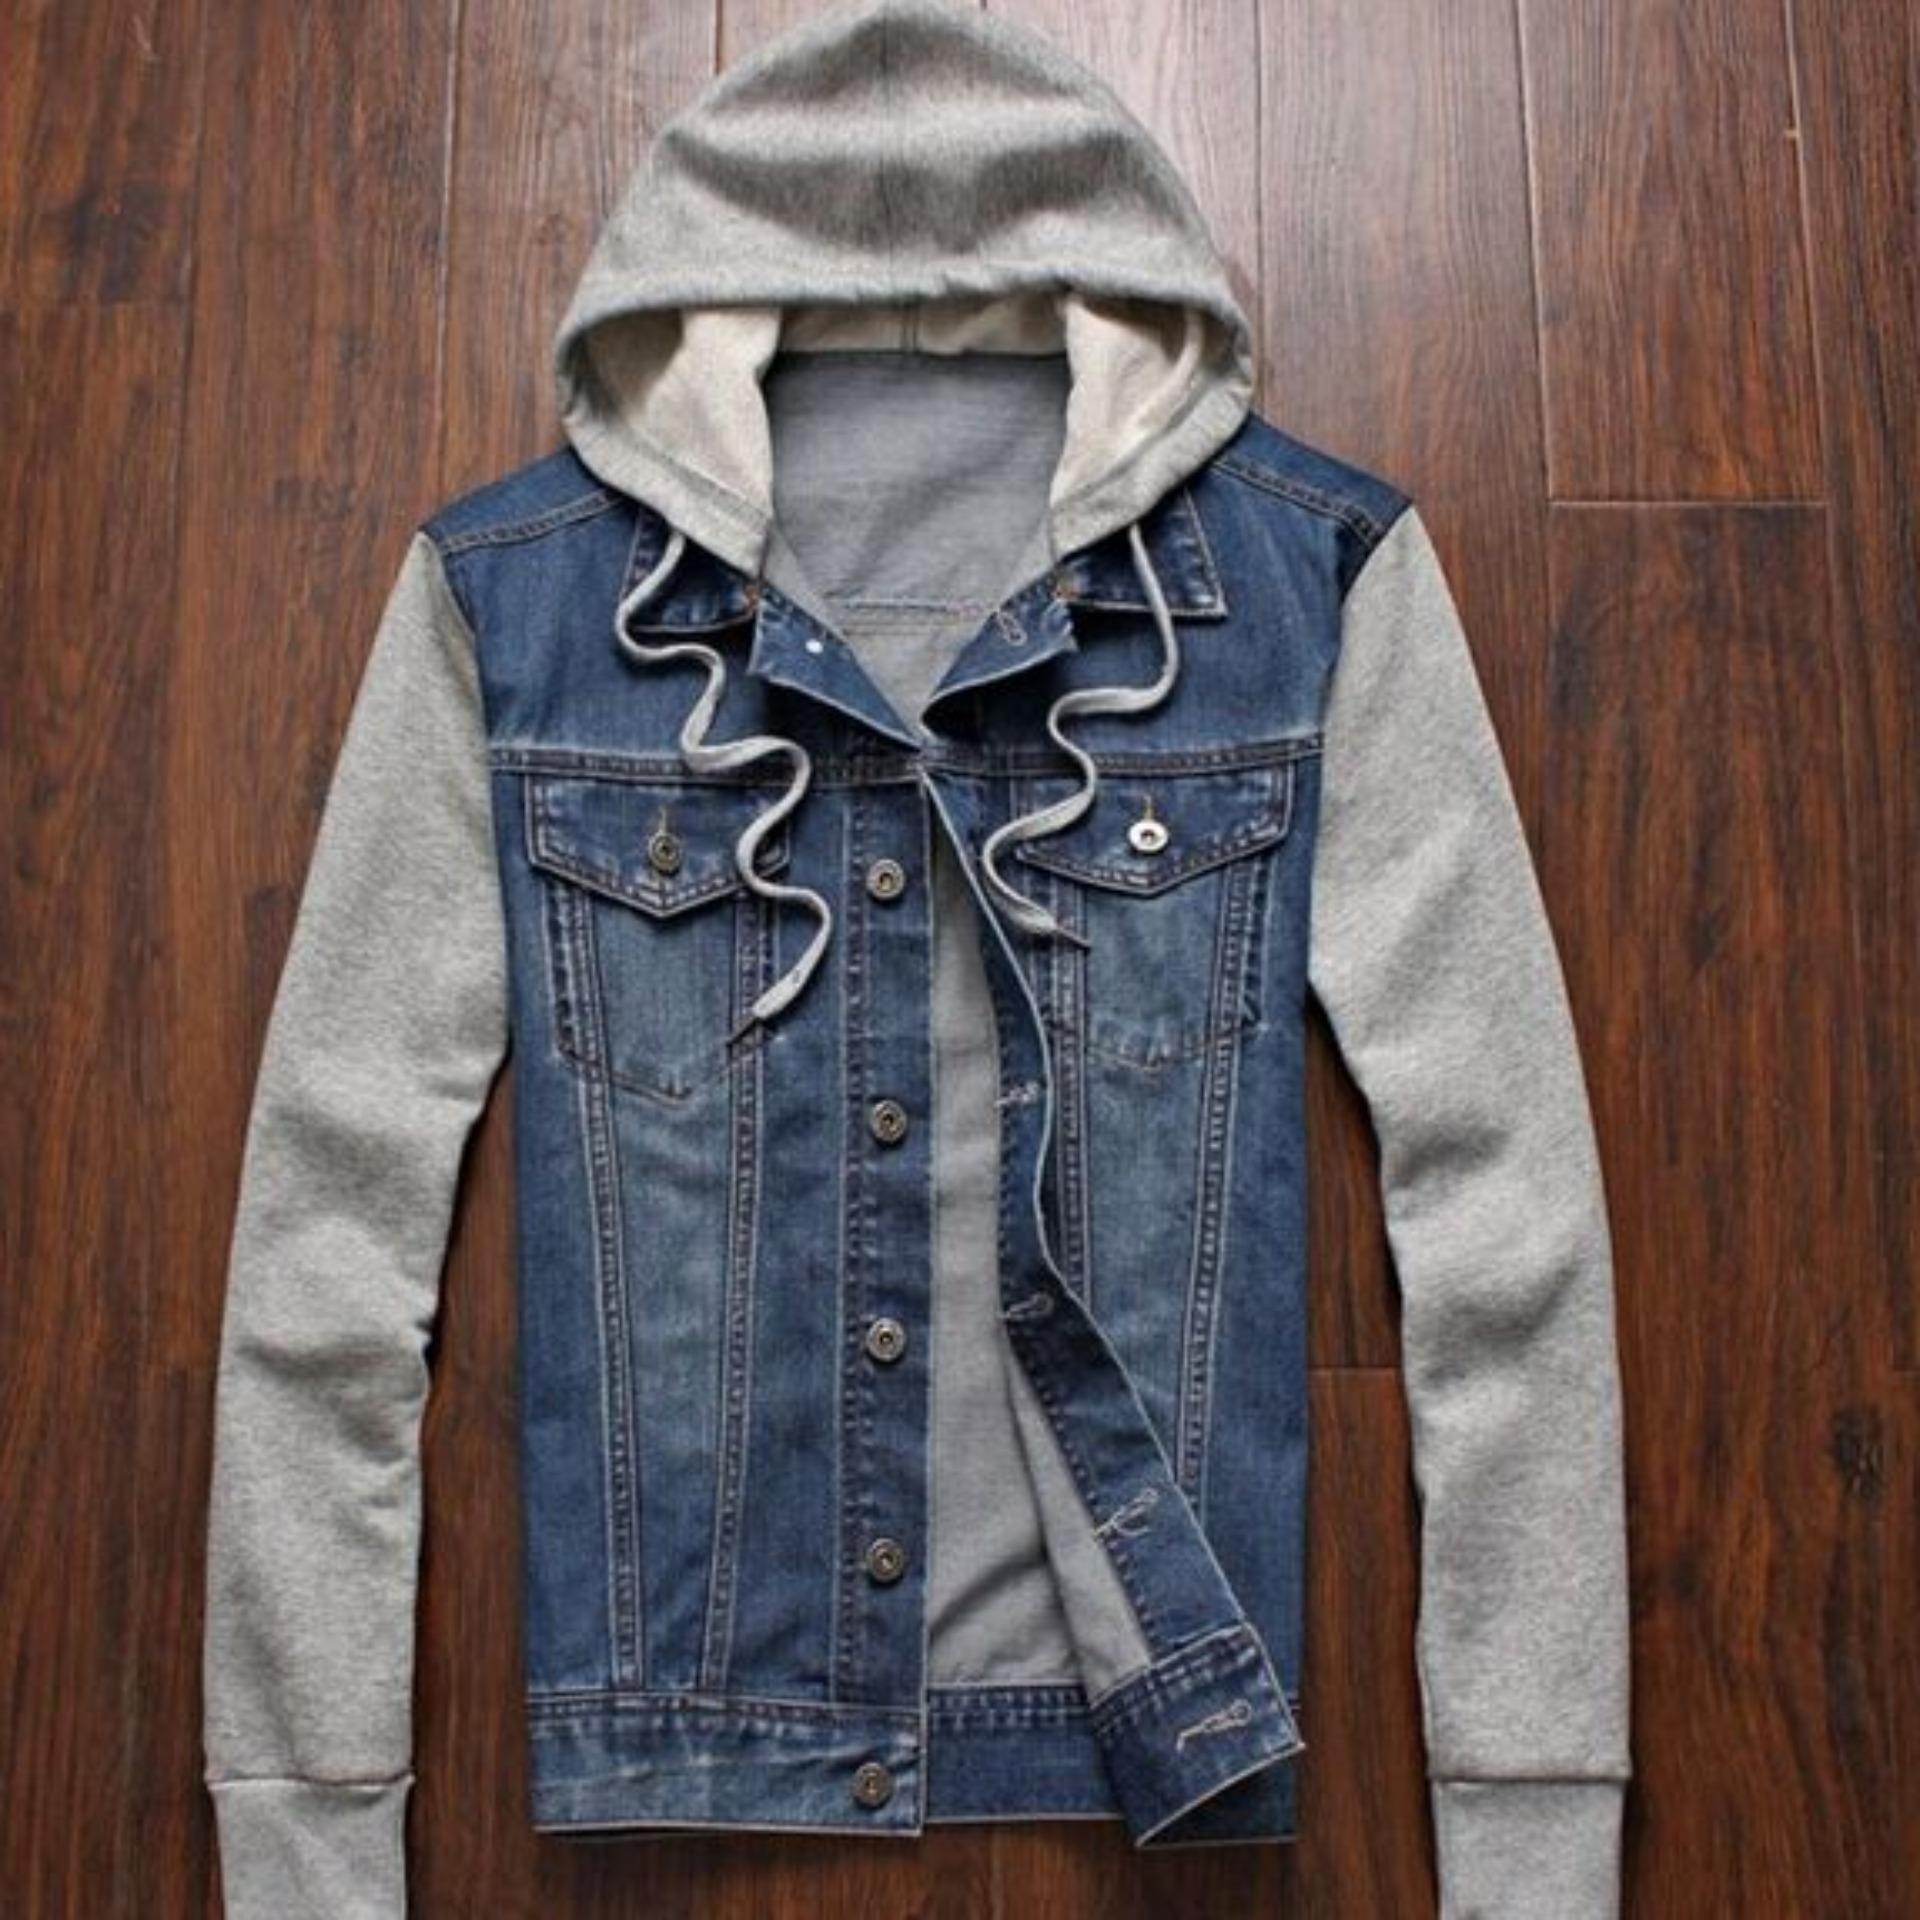 Mens jacket lazada - Mens Jacket Lazada 11